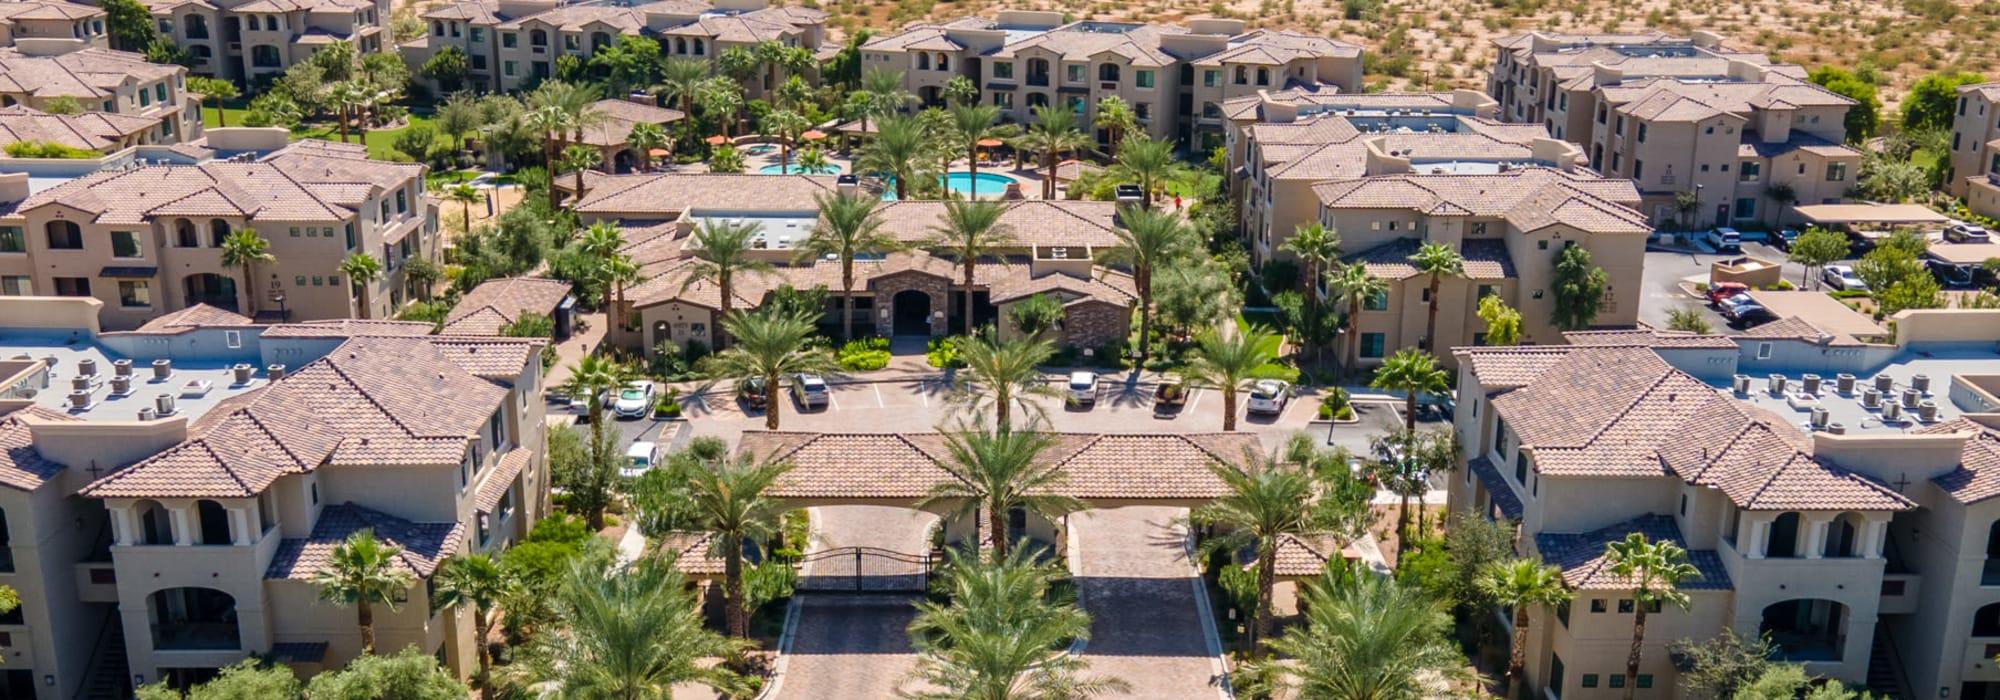 Aerial image of San Milan in Phoenix, Arizona